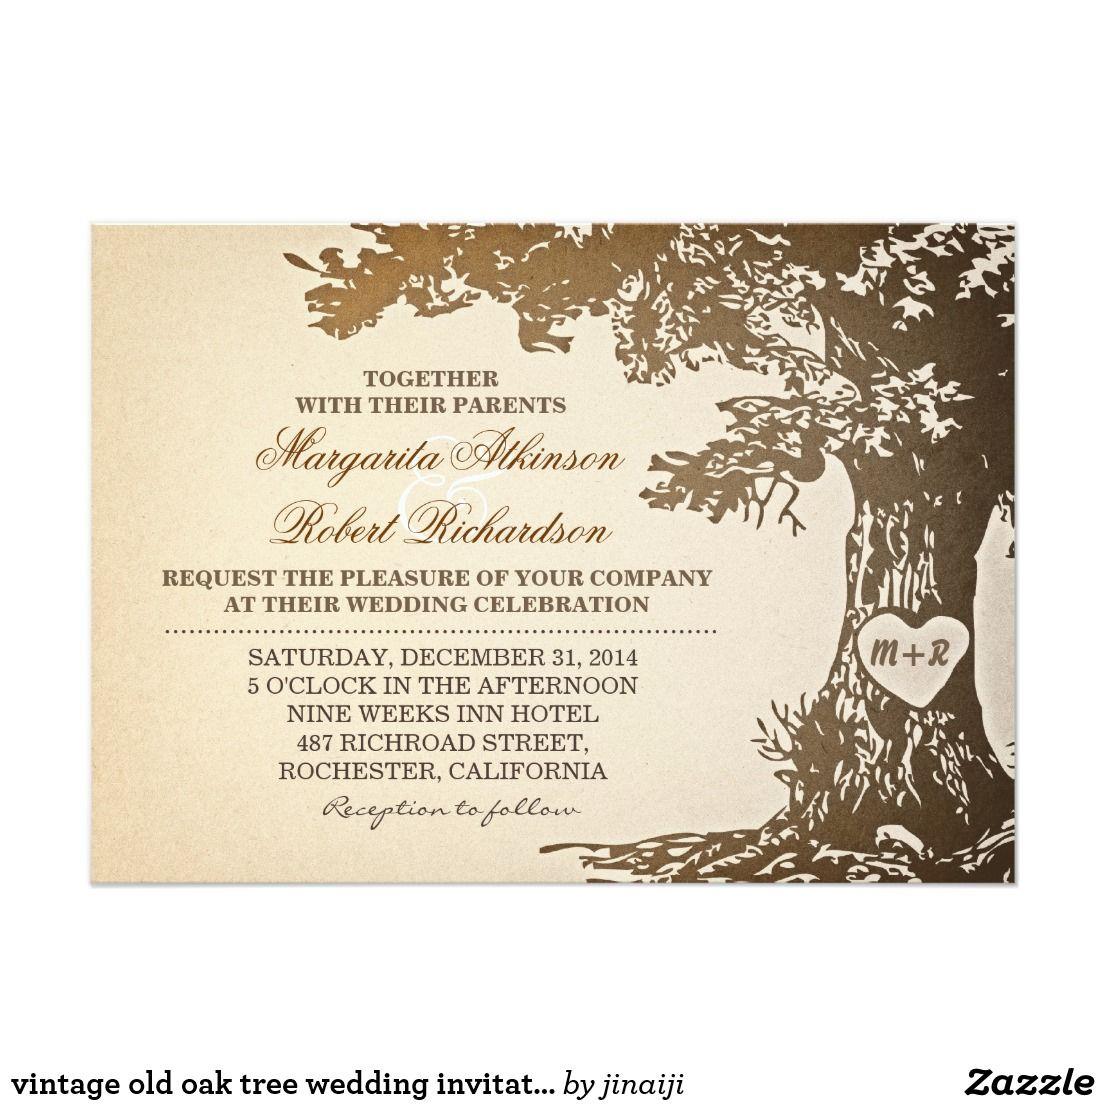 Vintage Old Oak Tree Wedding Invitations Carved Love Heart And Rustic Fun Invites